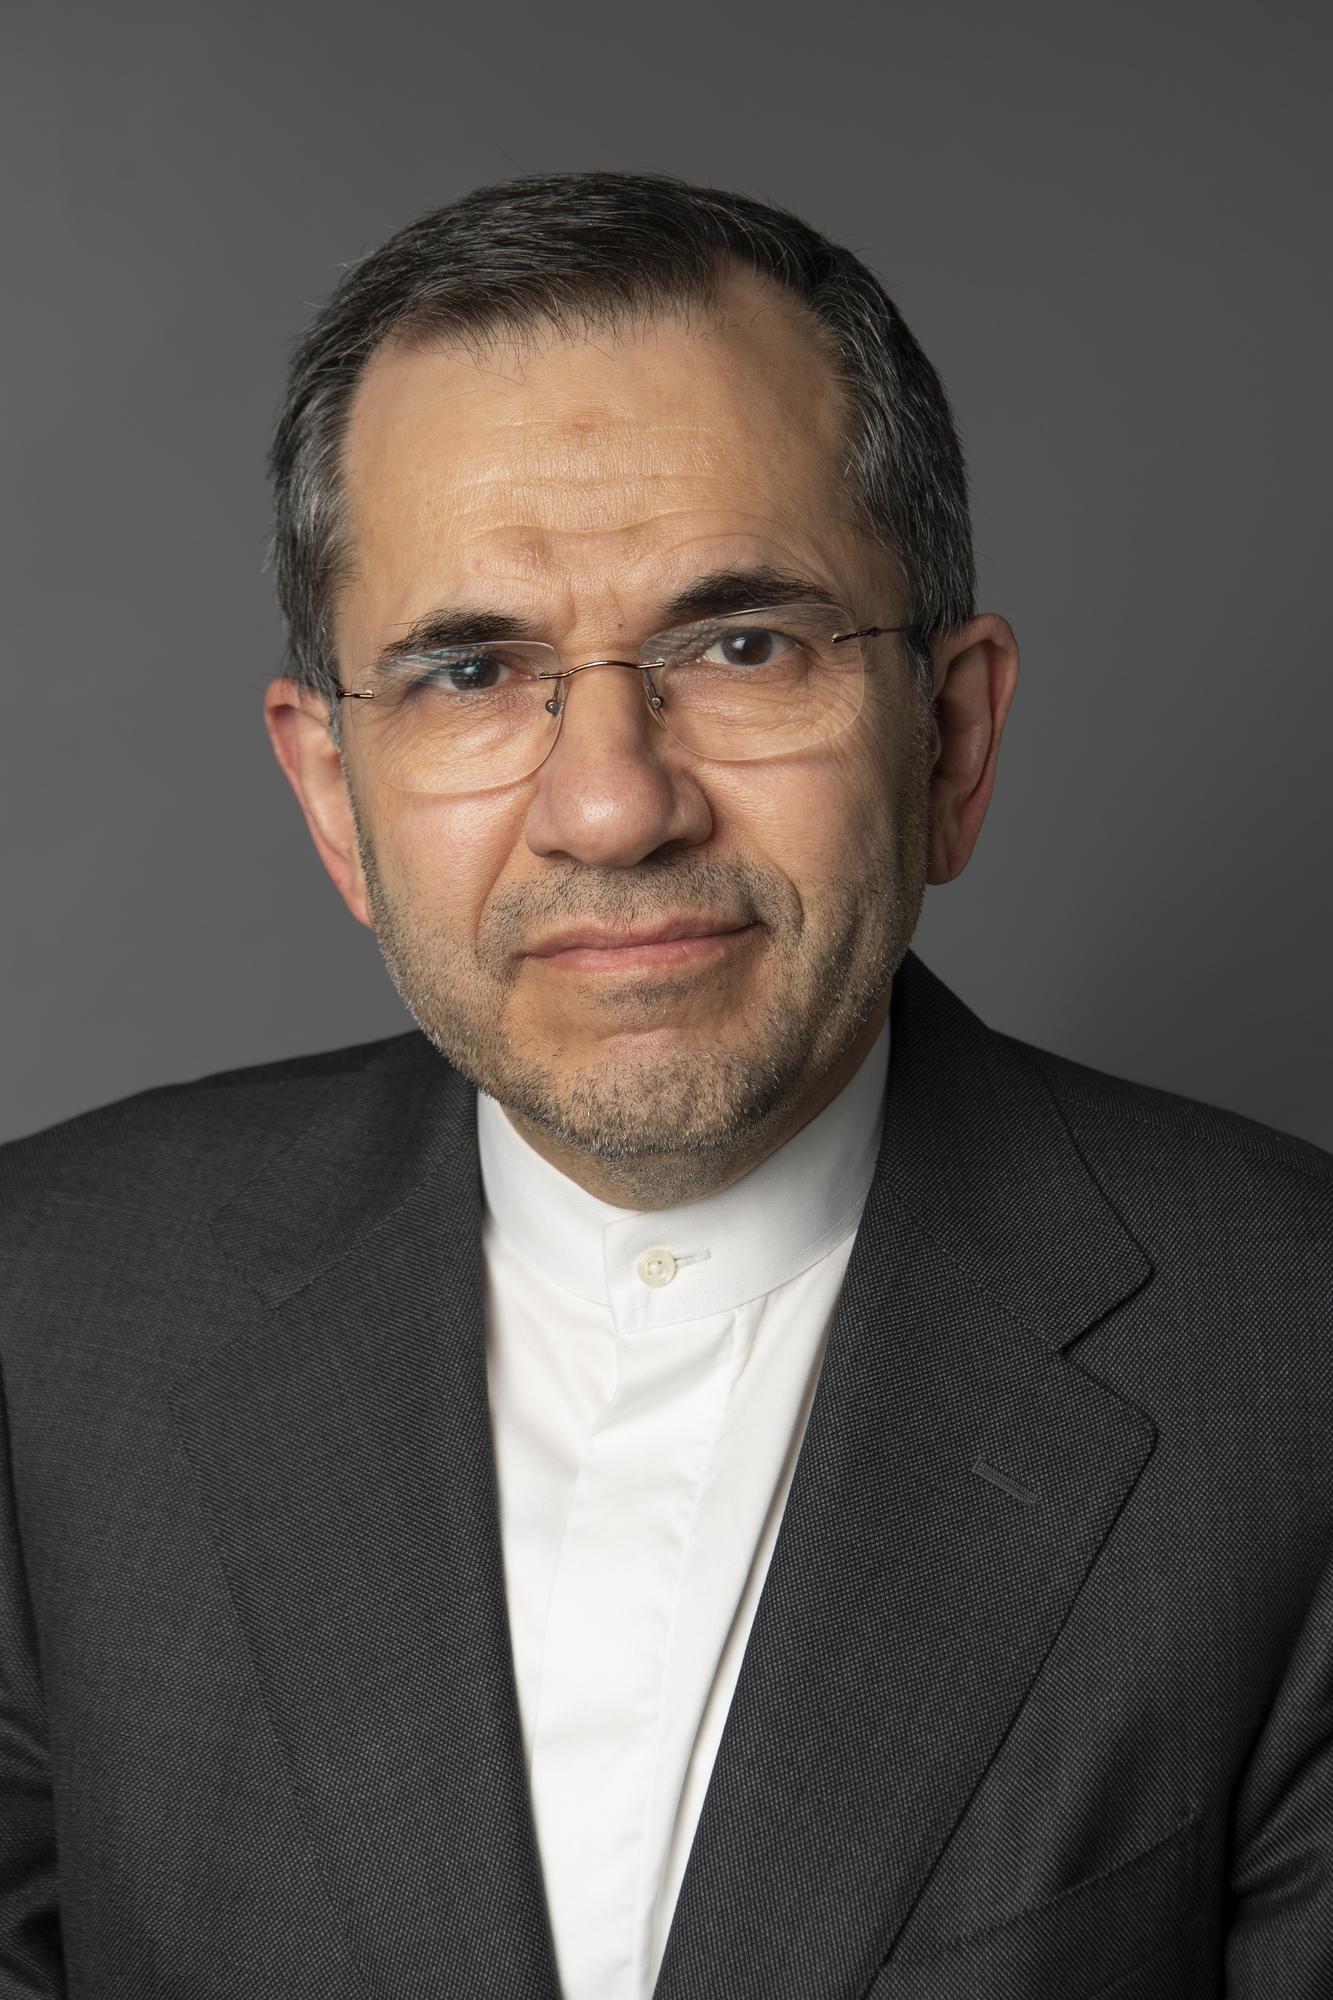 Majid Takht Ravanchi, ambassadeur d'Iran aux Nations unies.